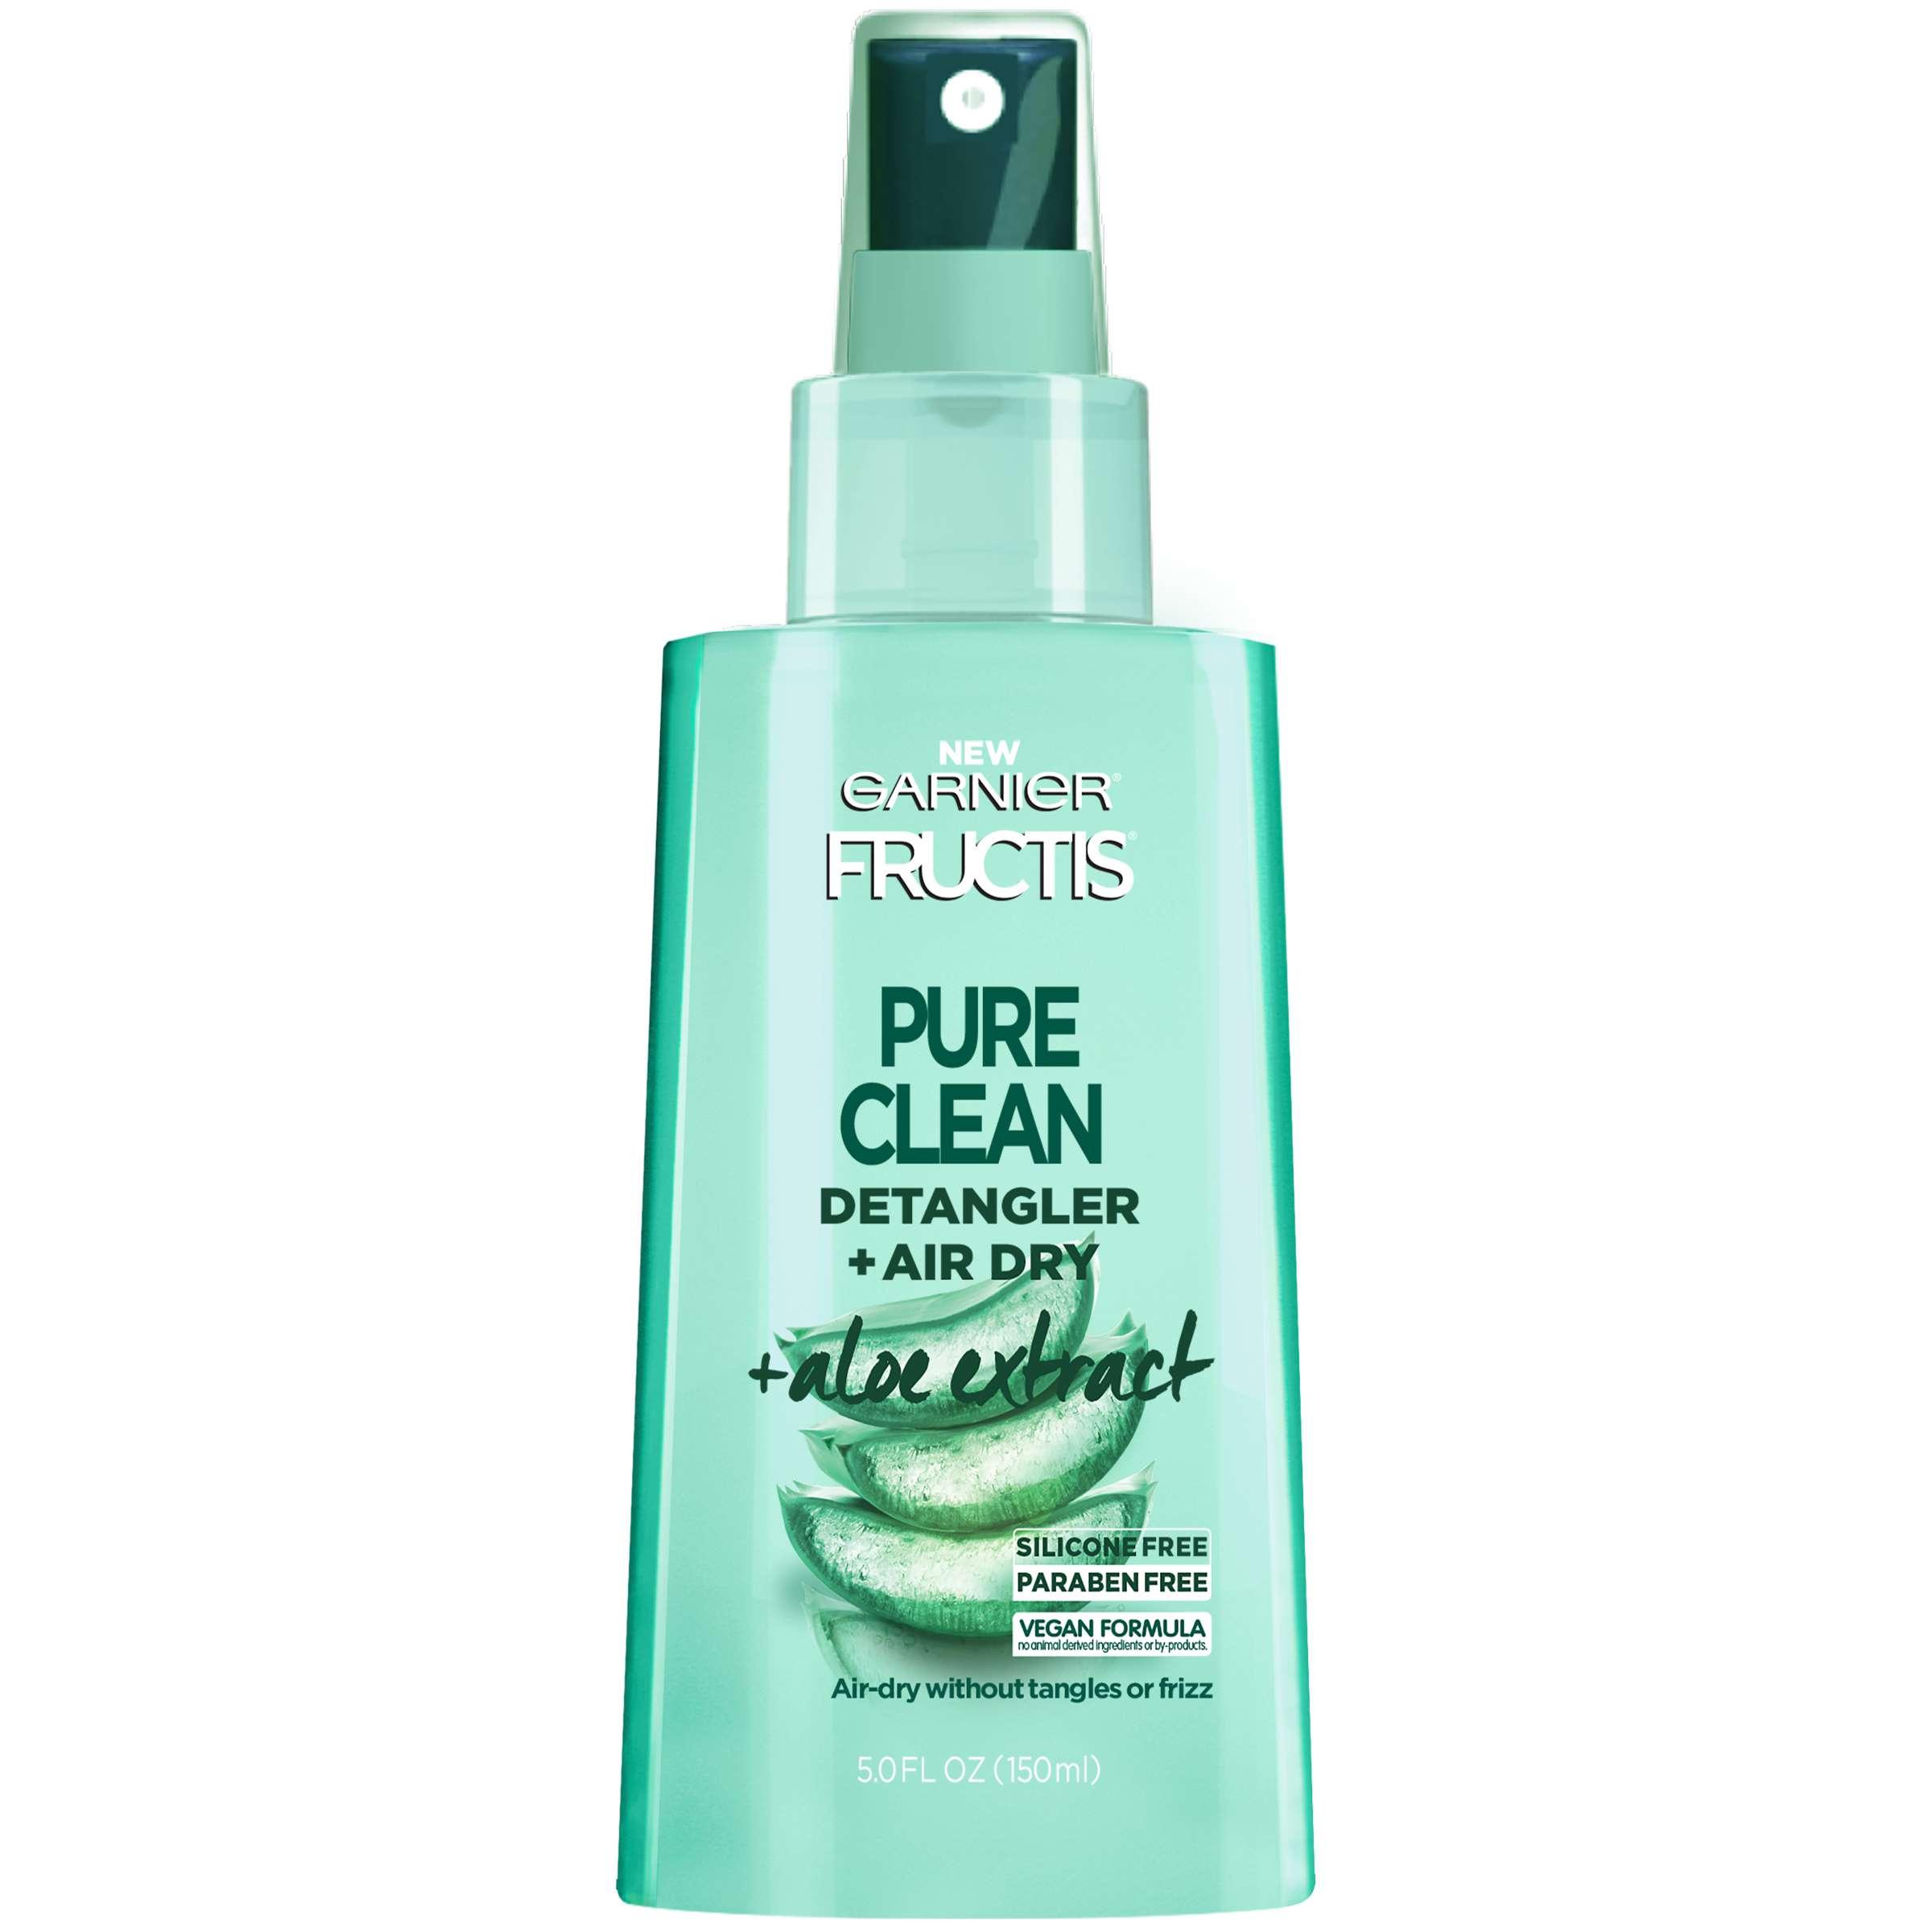 Garnier Fructis Pure Clean Detangler + Air Dry